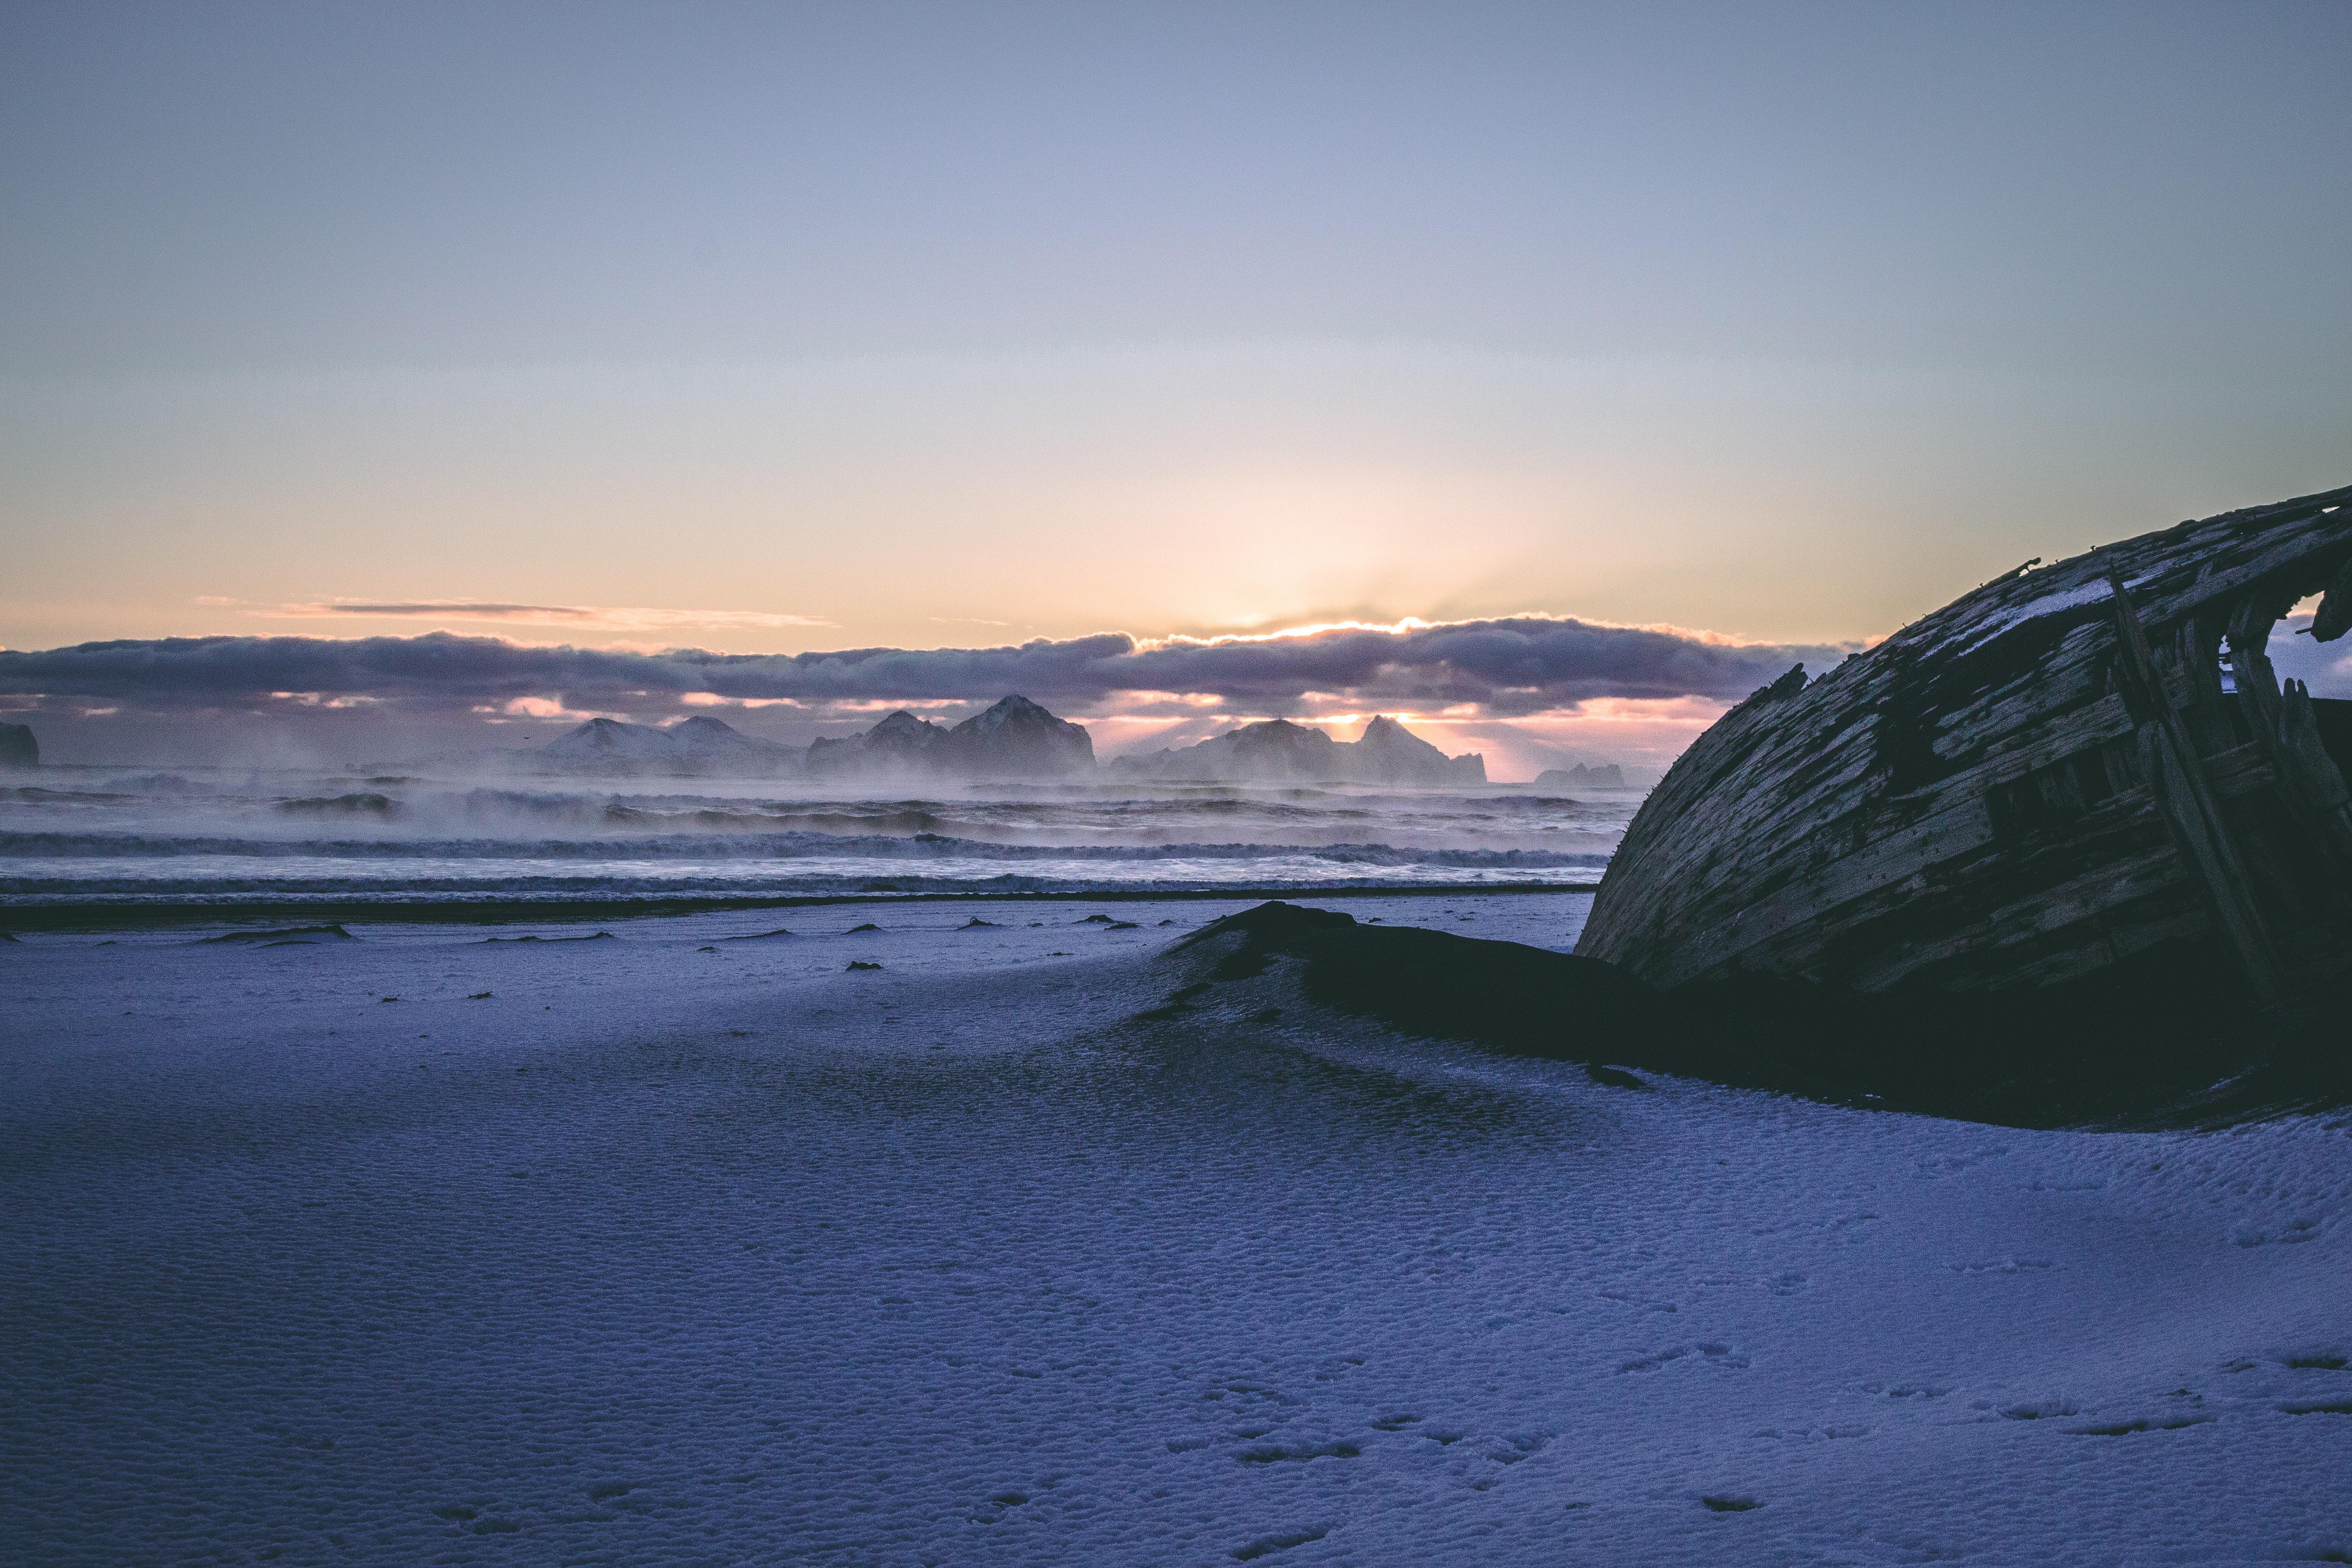 Brown Sand Under White Sky, Beach, Sea, Waves, Water, HQ Photo